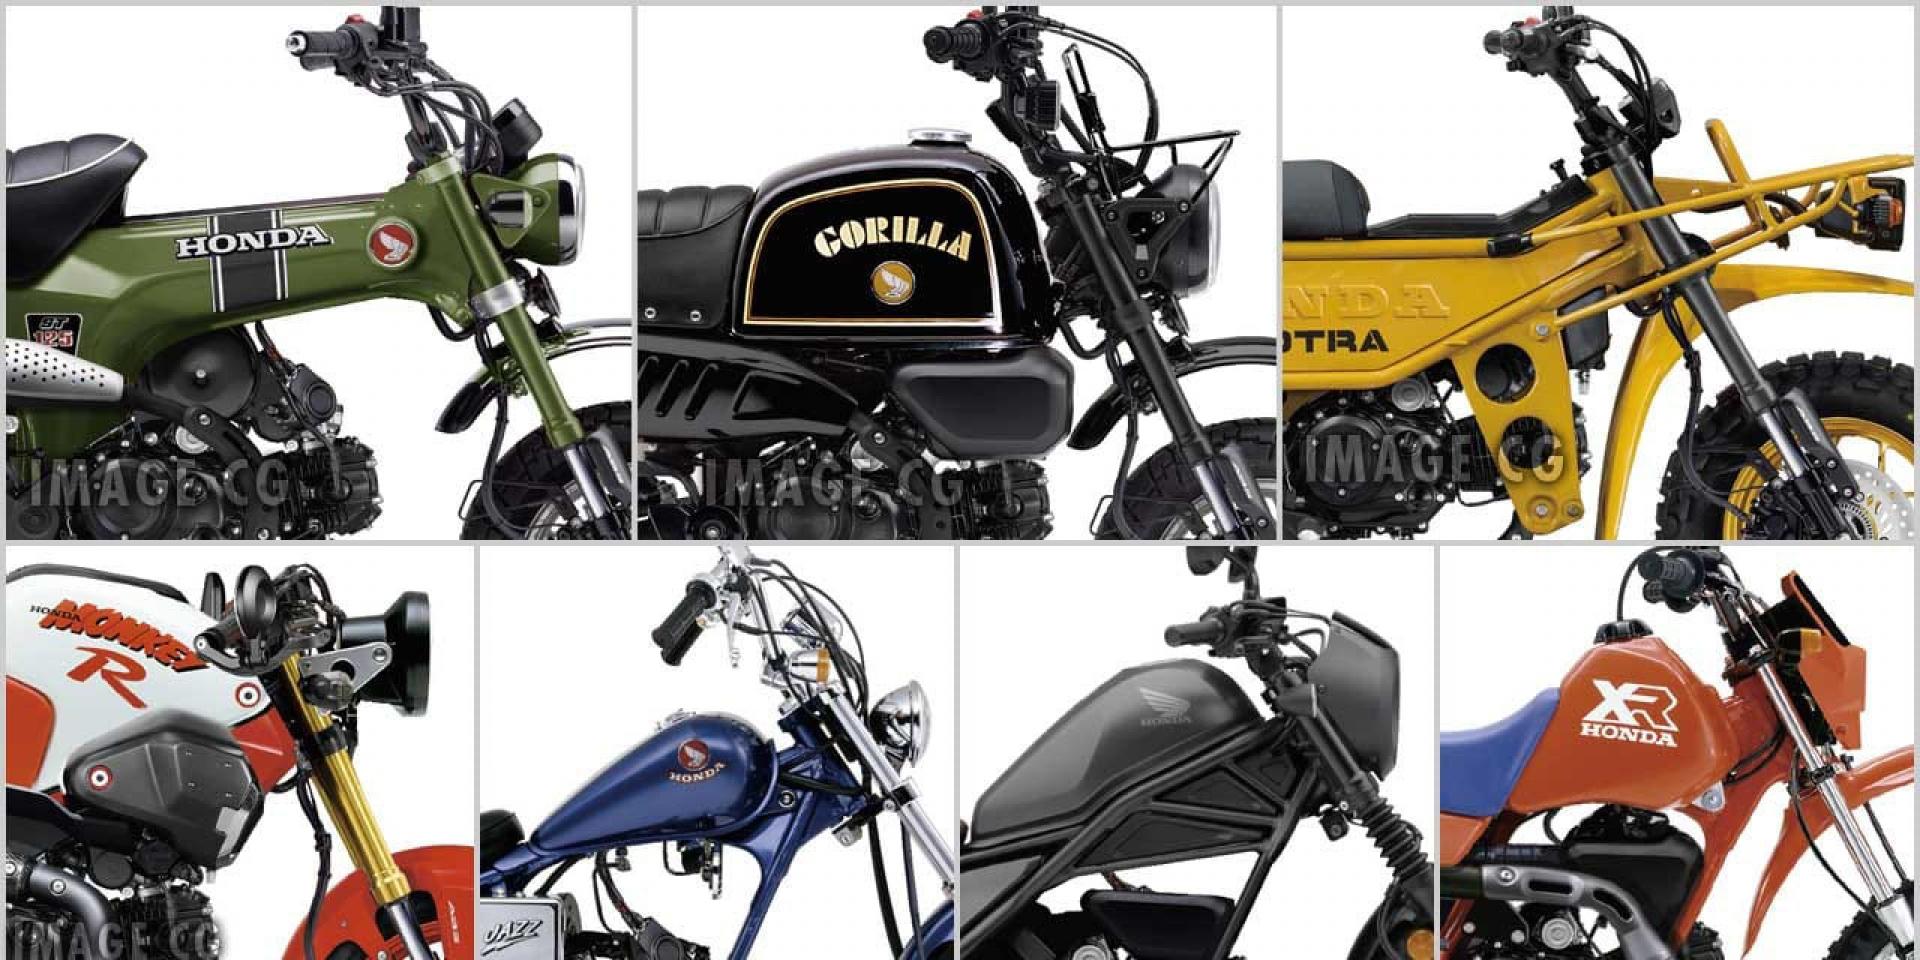 HONDA Fun Bike壓箱寶,日媒羅列七台有望登場的125衍生車!